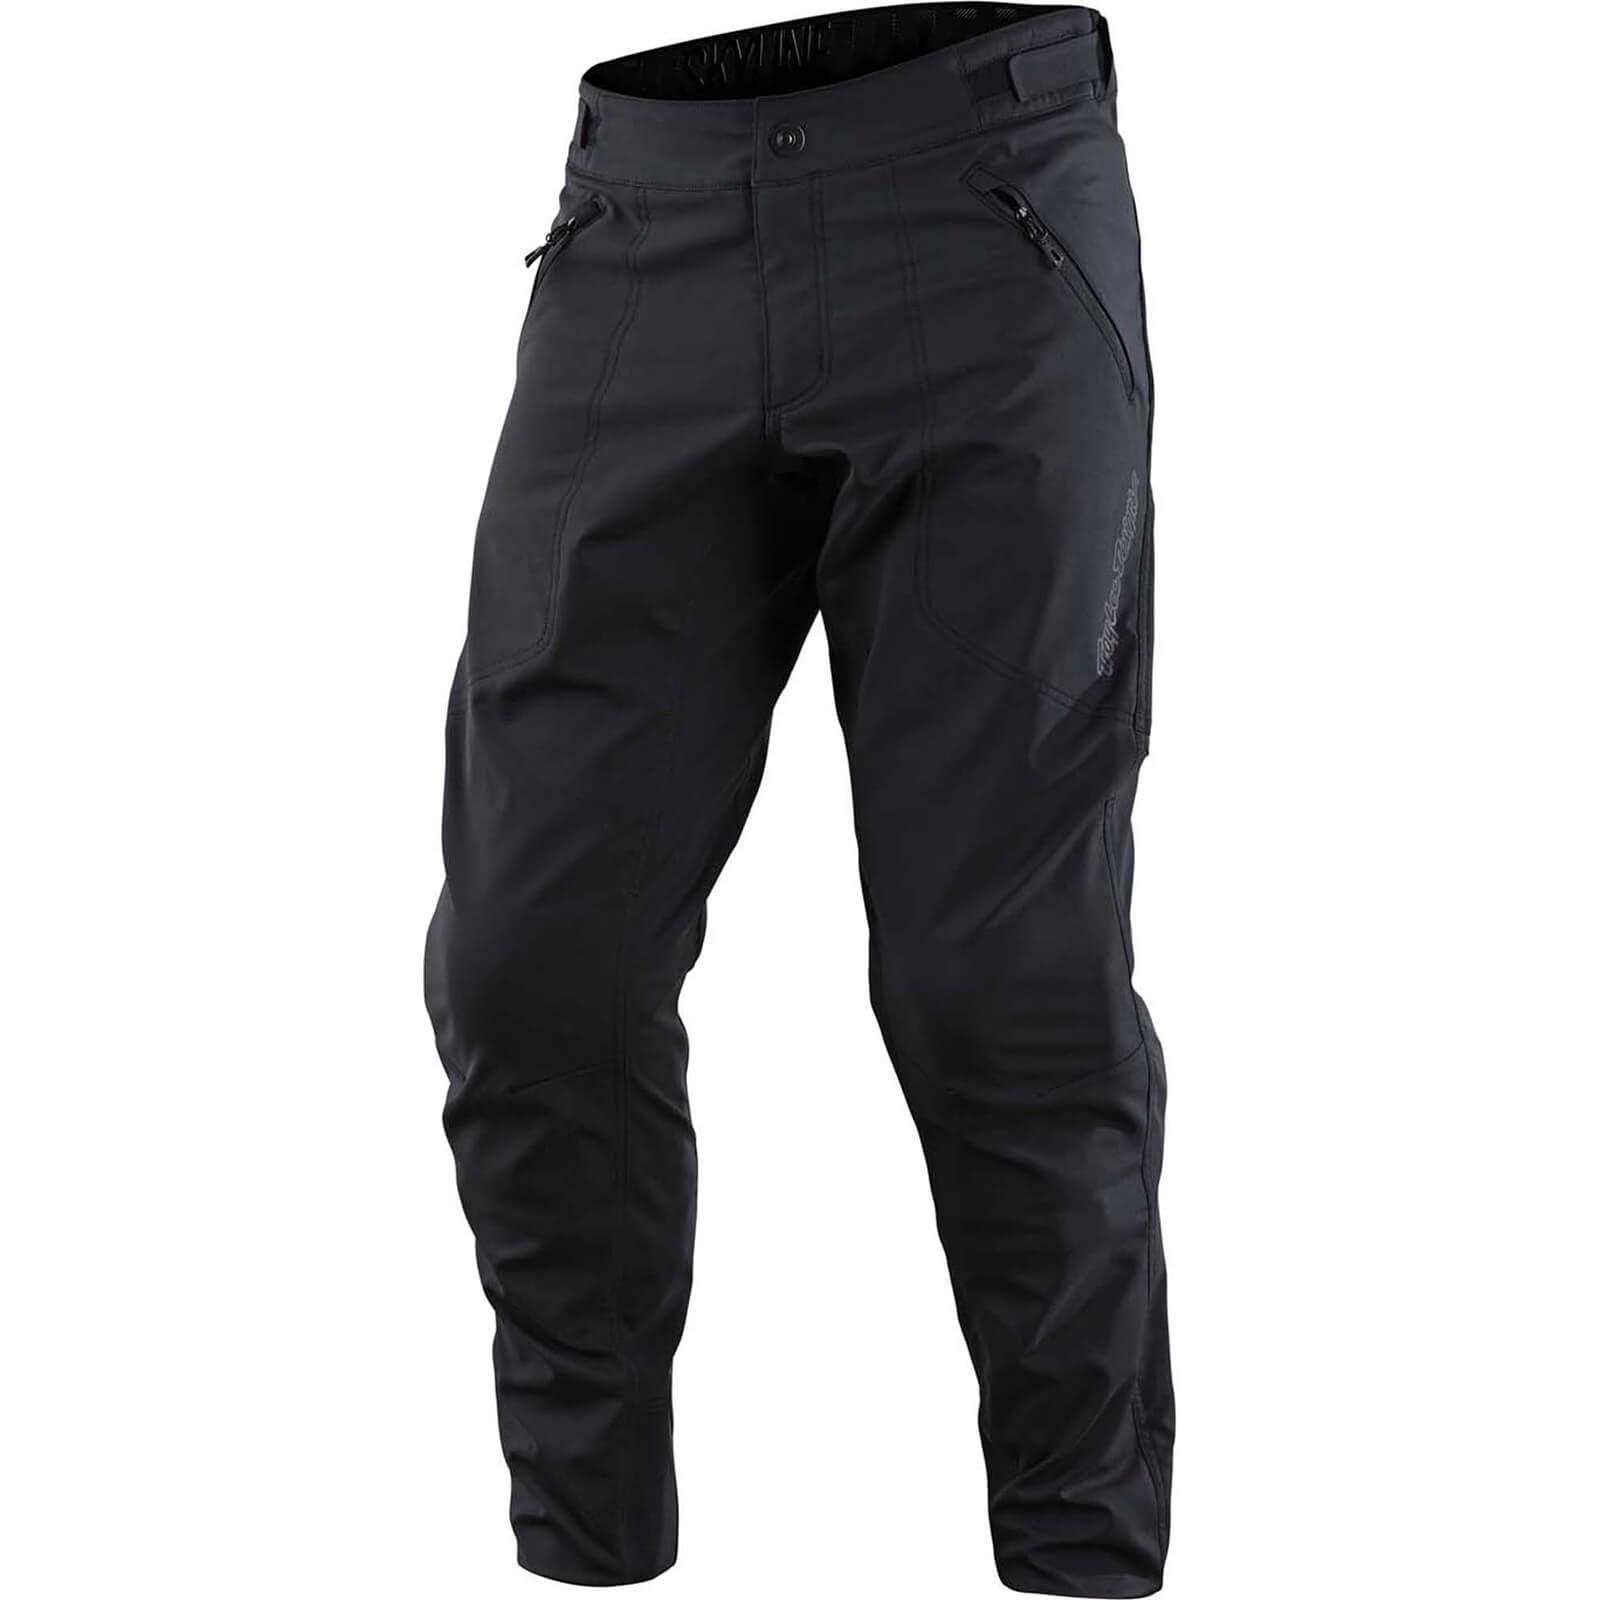 Troy Lee Designs Skyline MTB Pant - 32 - Black